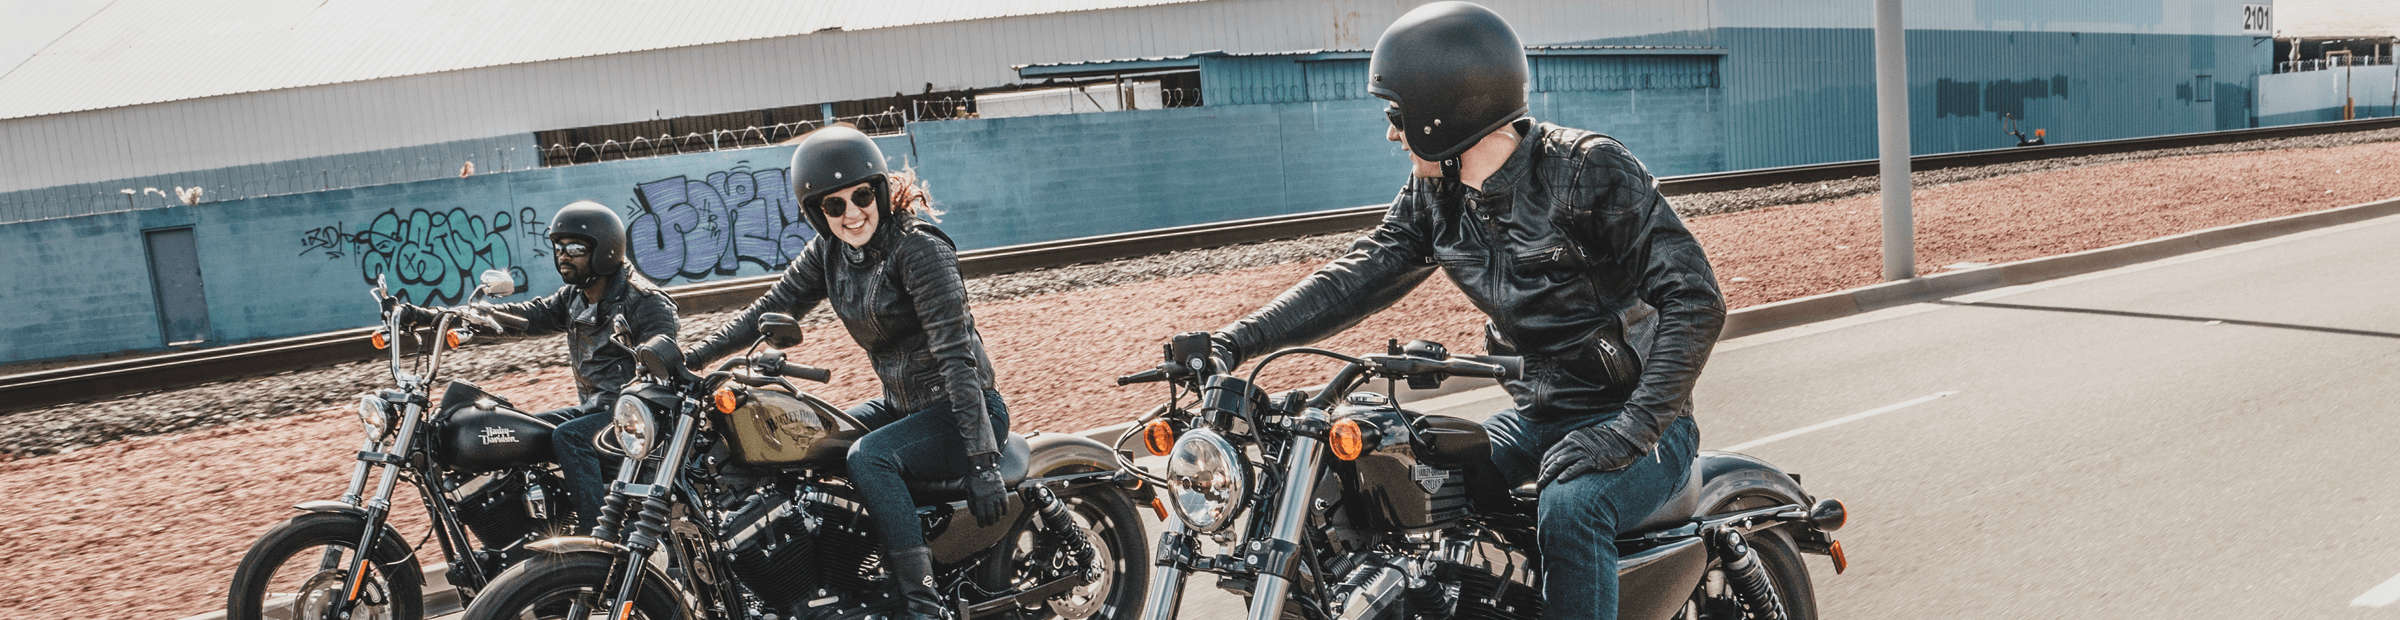 Introducing Harley-Davidson<sup>®</sup> Black Label